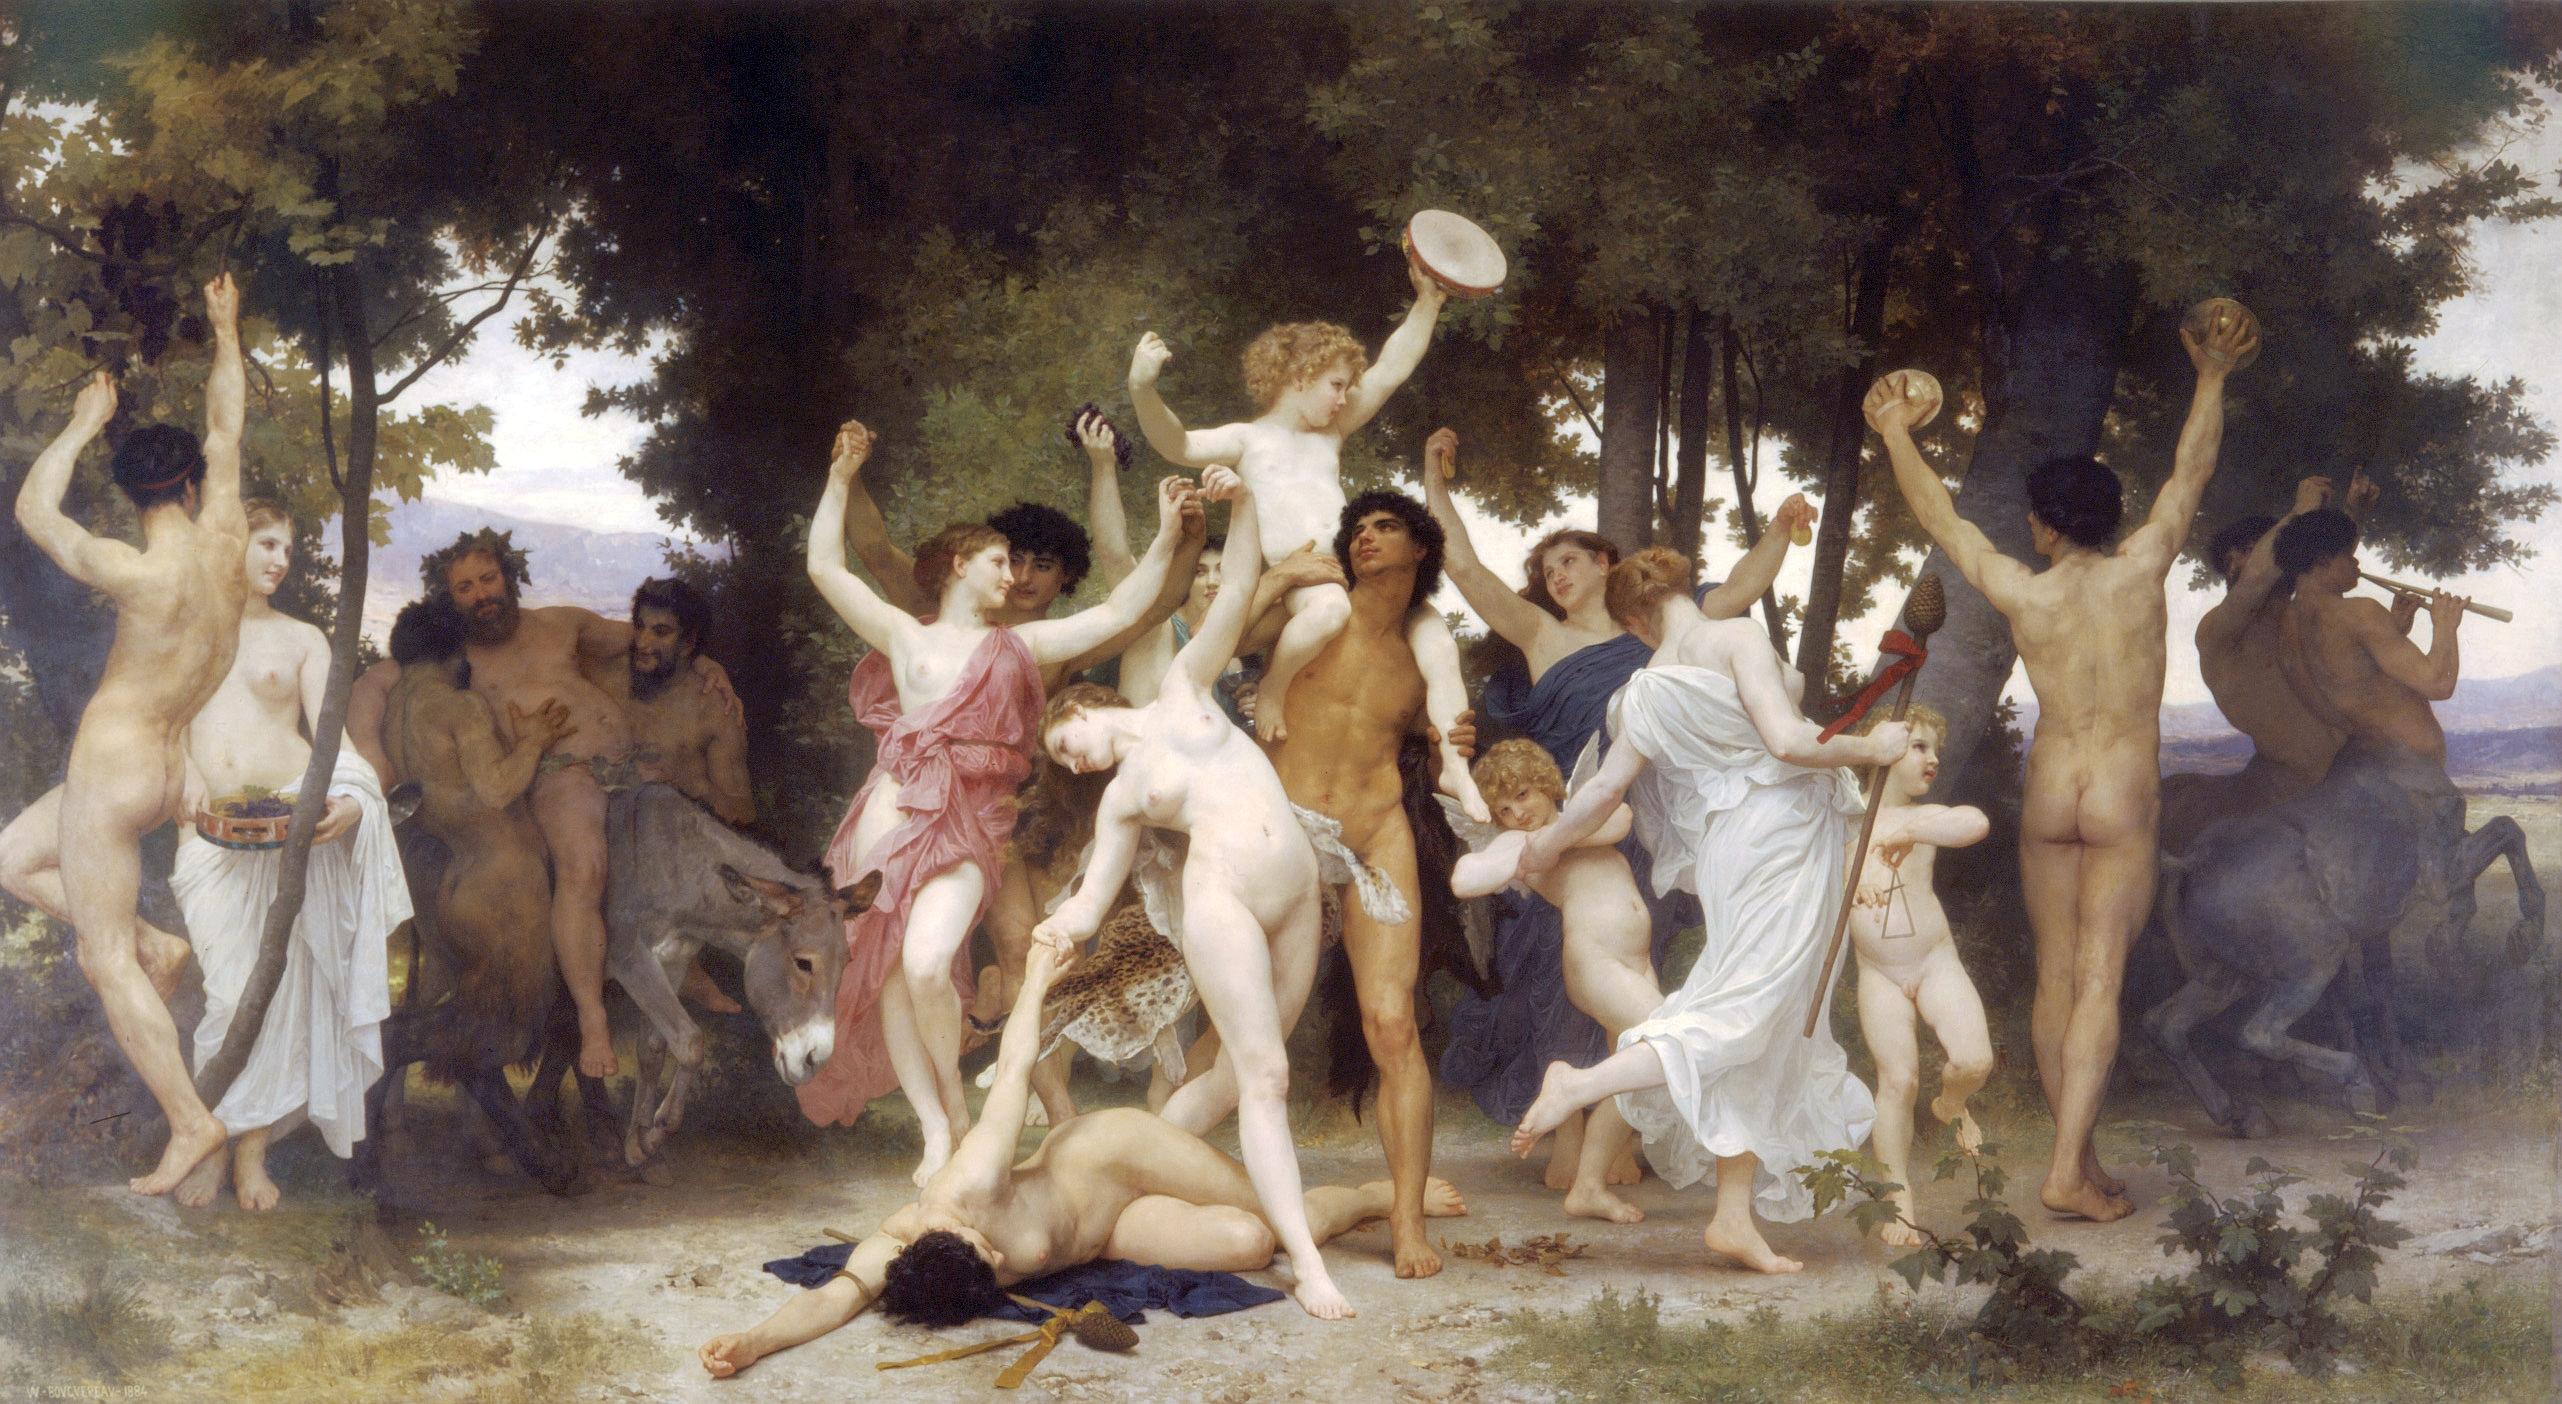 https://i2.wp.com/uploads4.wikiart.org/images/william-adolphe-bouguereau/the-youth-of-bacchus-1884.jpg